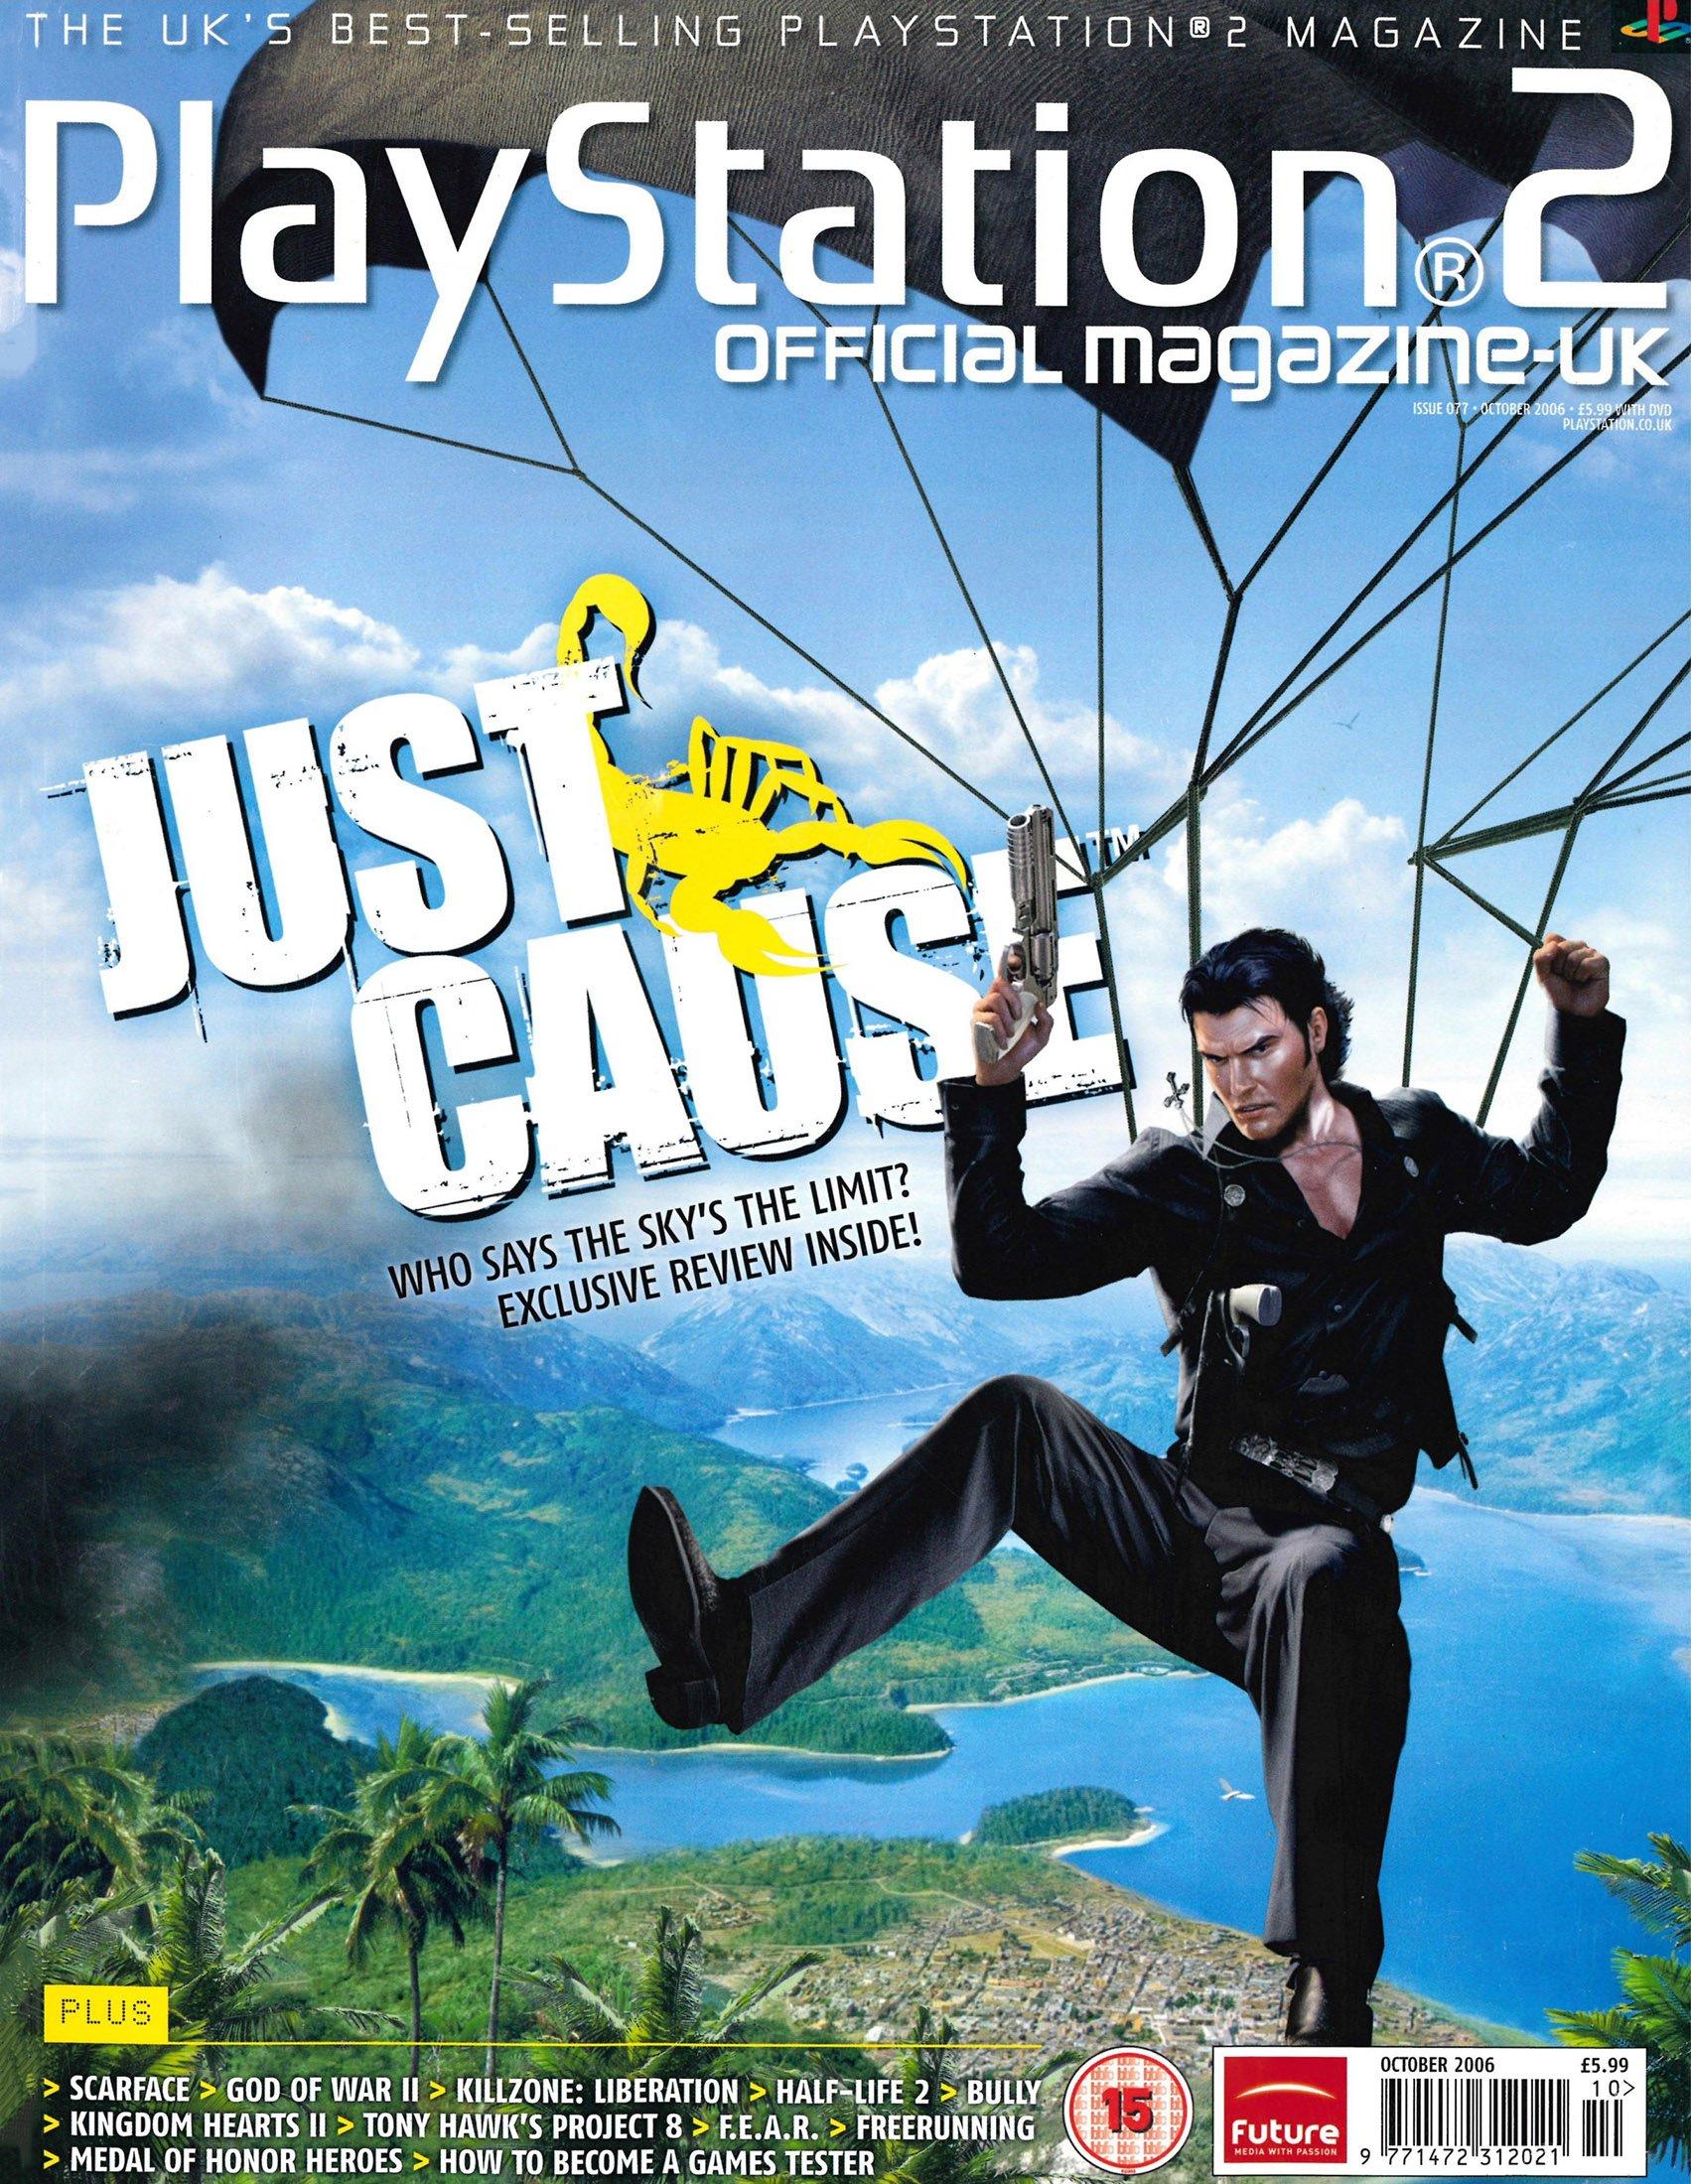 Official Playstation 2 Magazine UK 077 (October 2006)